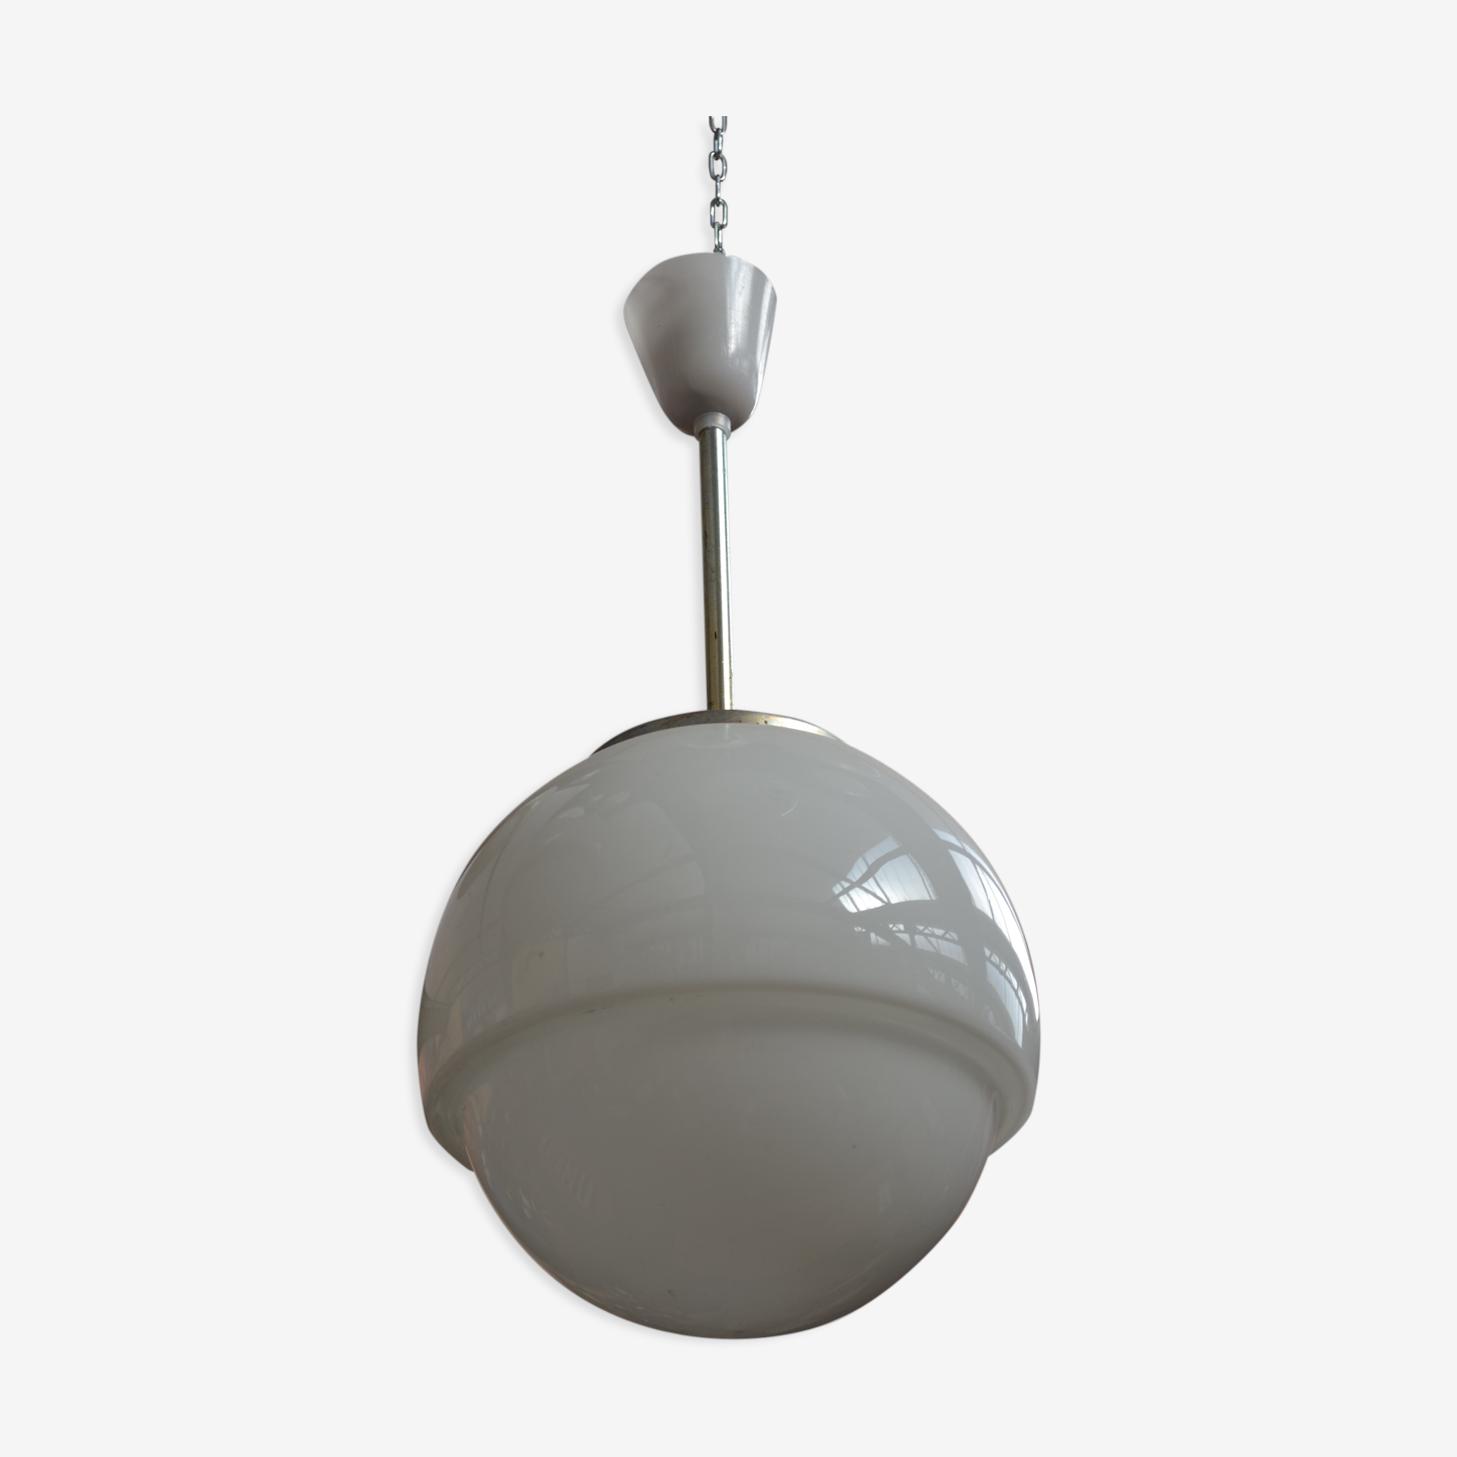 Suspension forme globe en opaline blanche